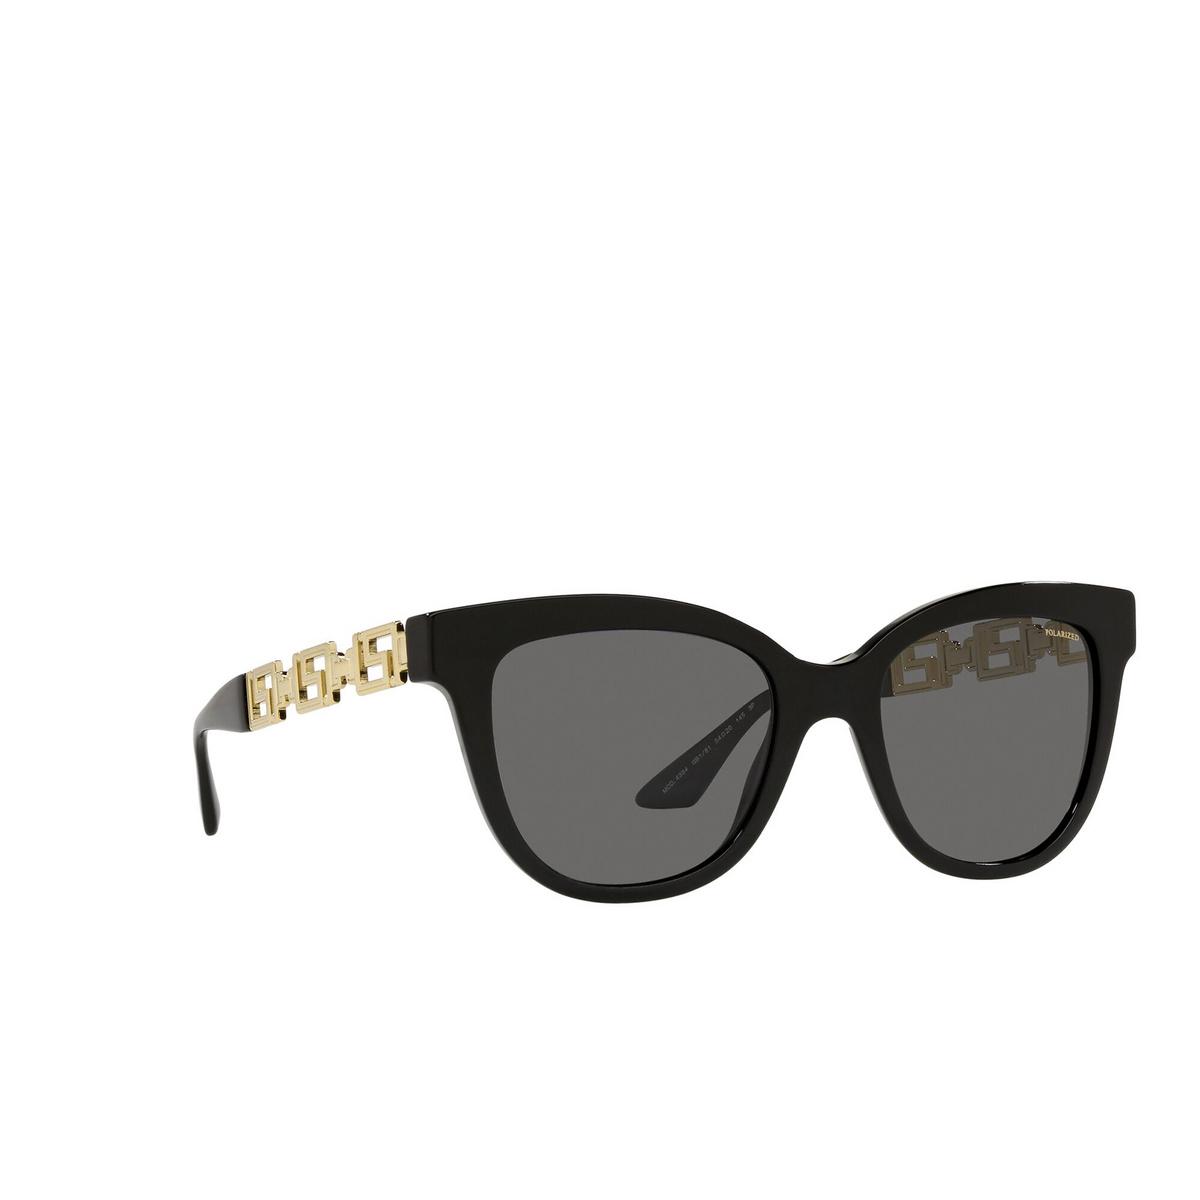 Versace® Cat-eye Sunglasses: VE4394 color Black GB1/81 - three-quarters view.